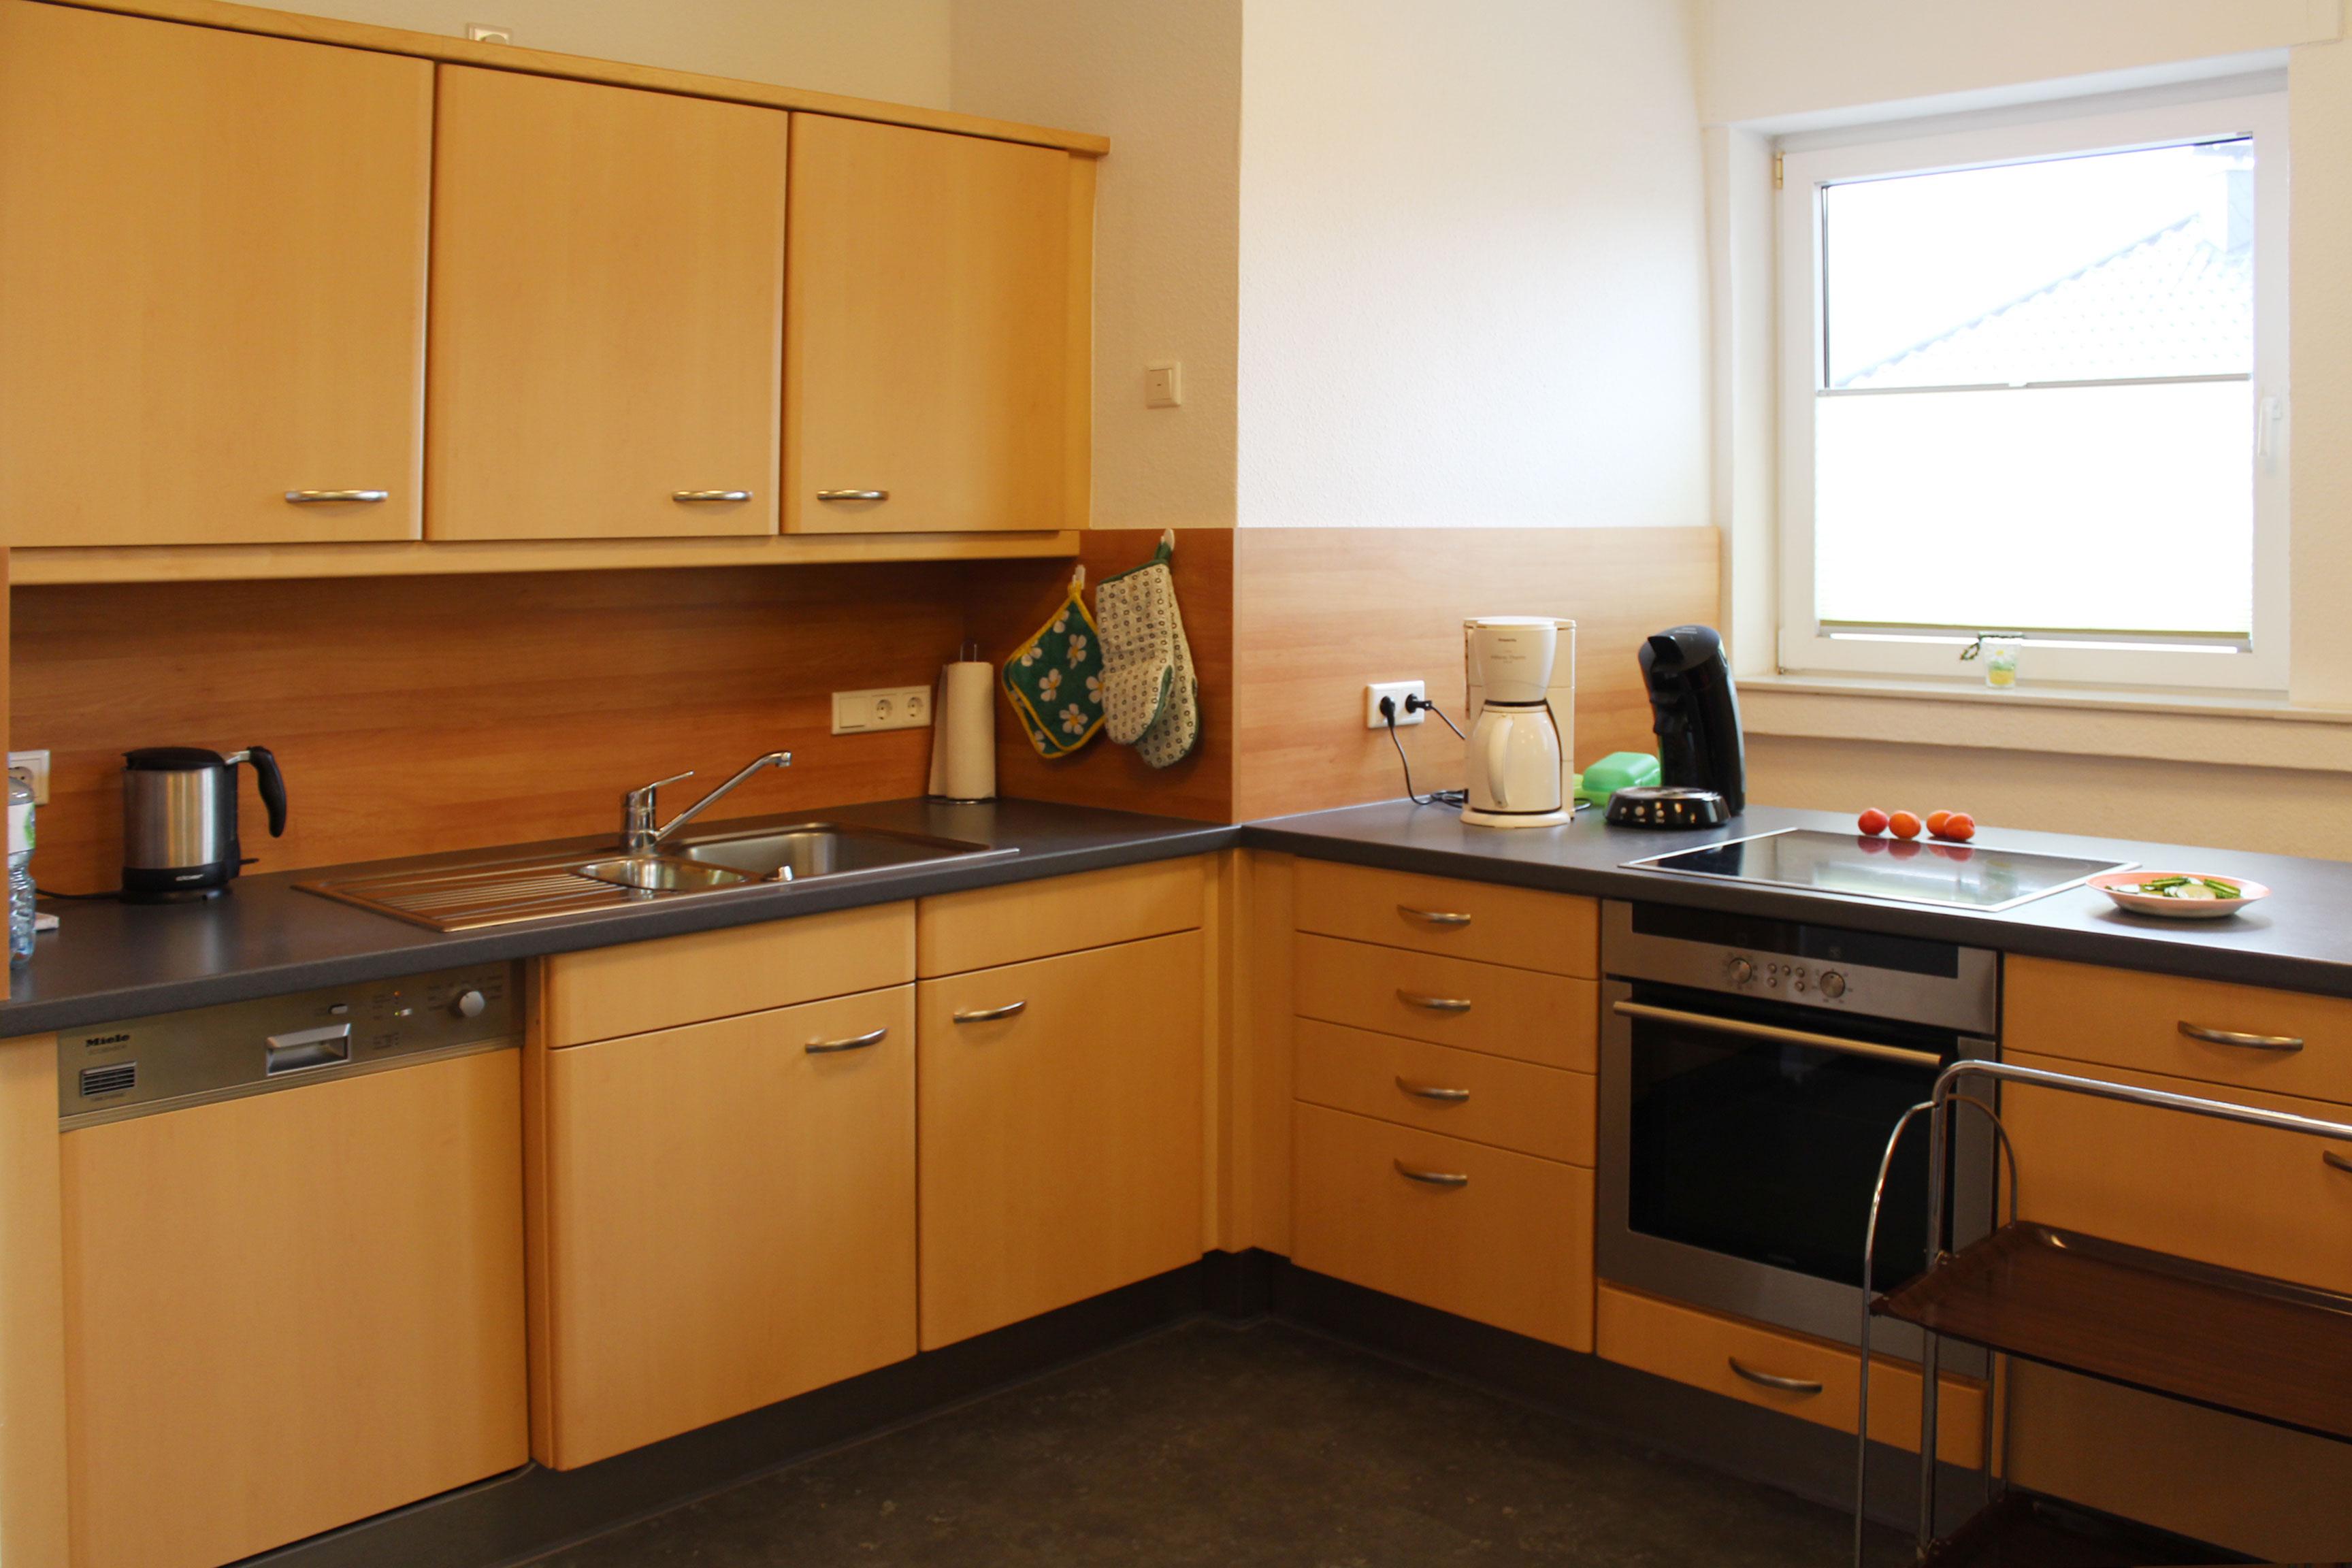 kindergarten st marien kath kindergarten in saerbeck. Black Bedroom Furniture Sets. Home Design Ideas